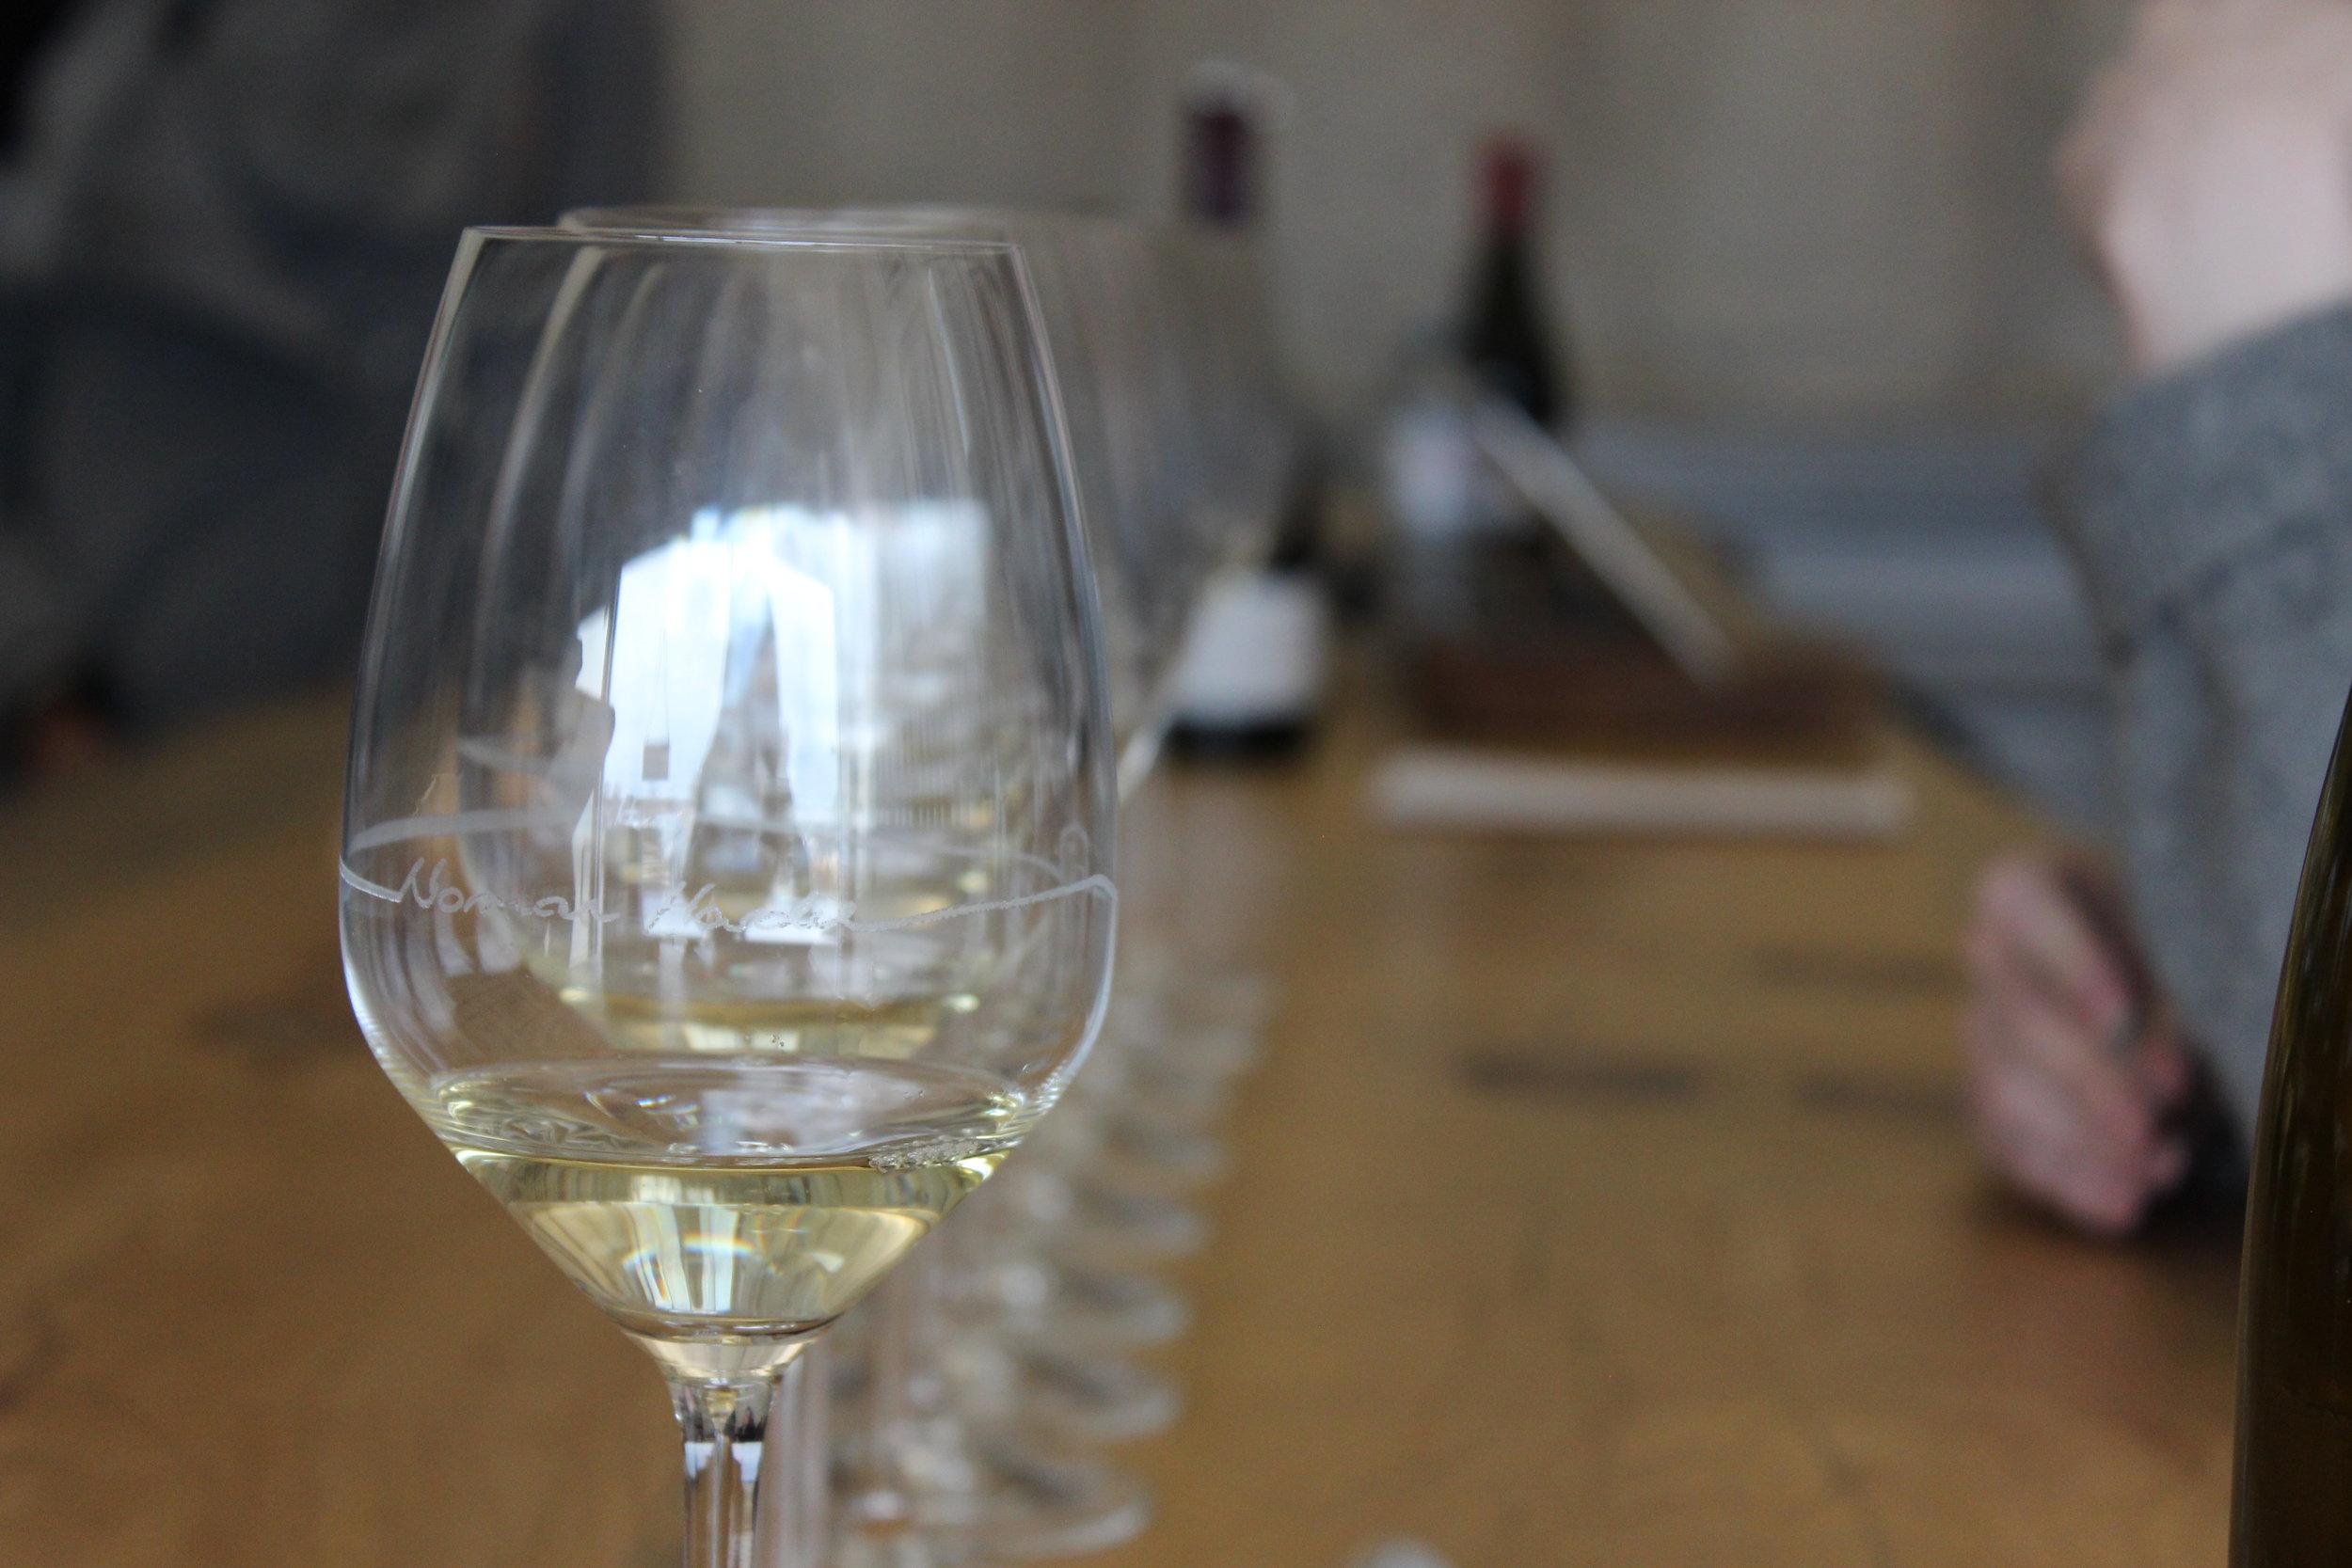 norman hardy winery